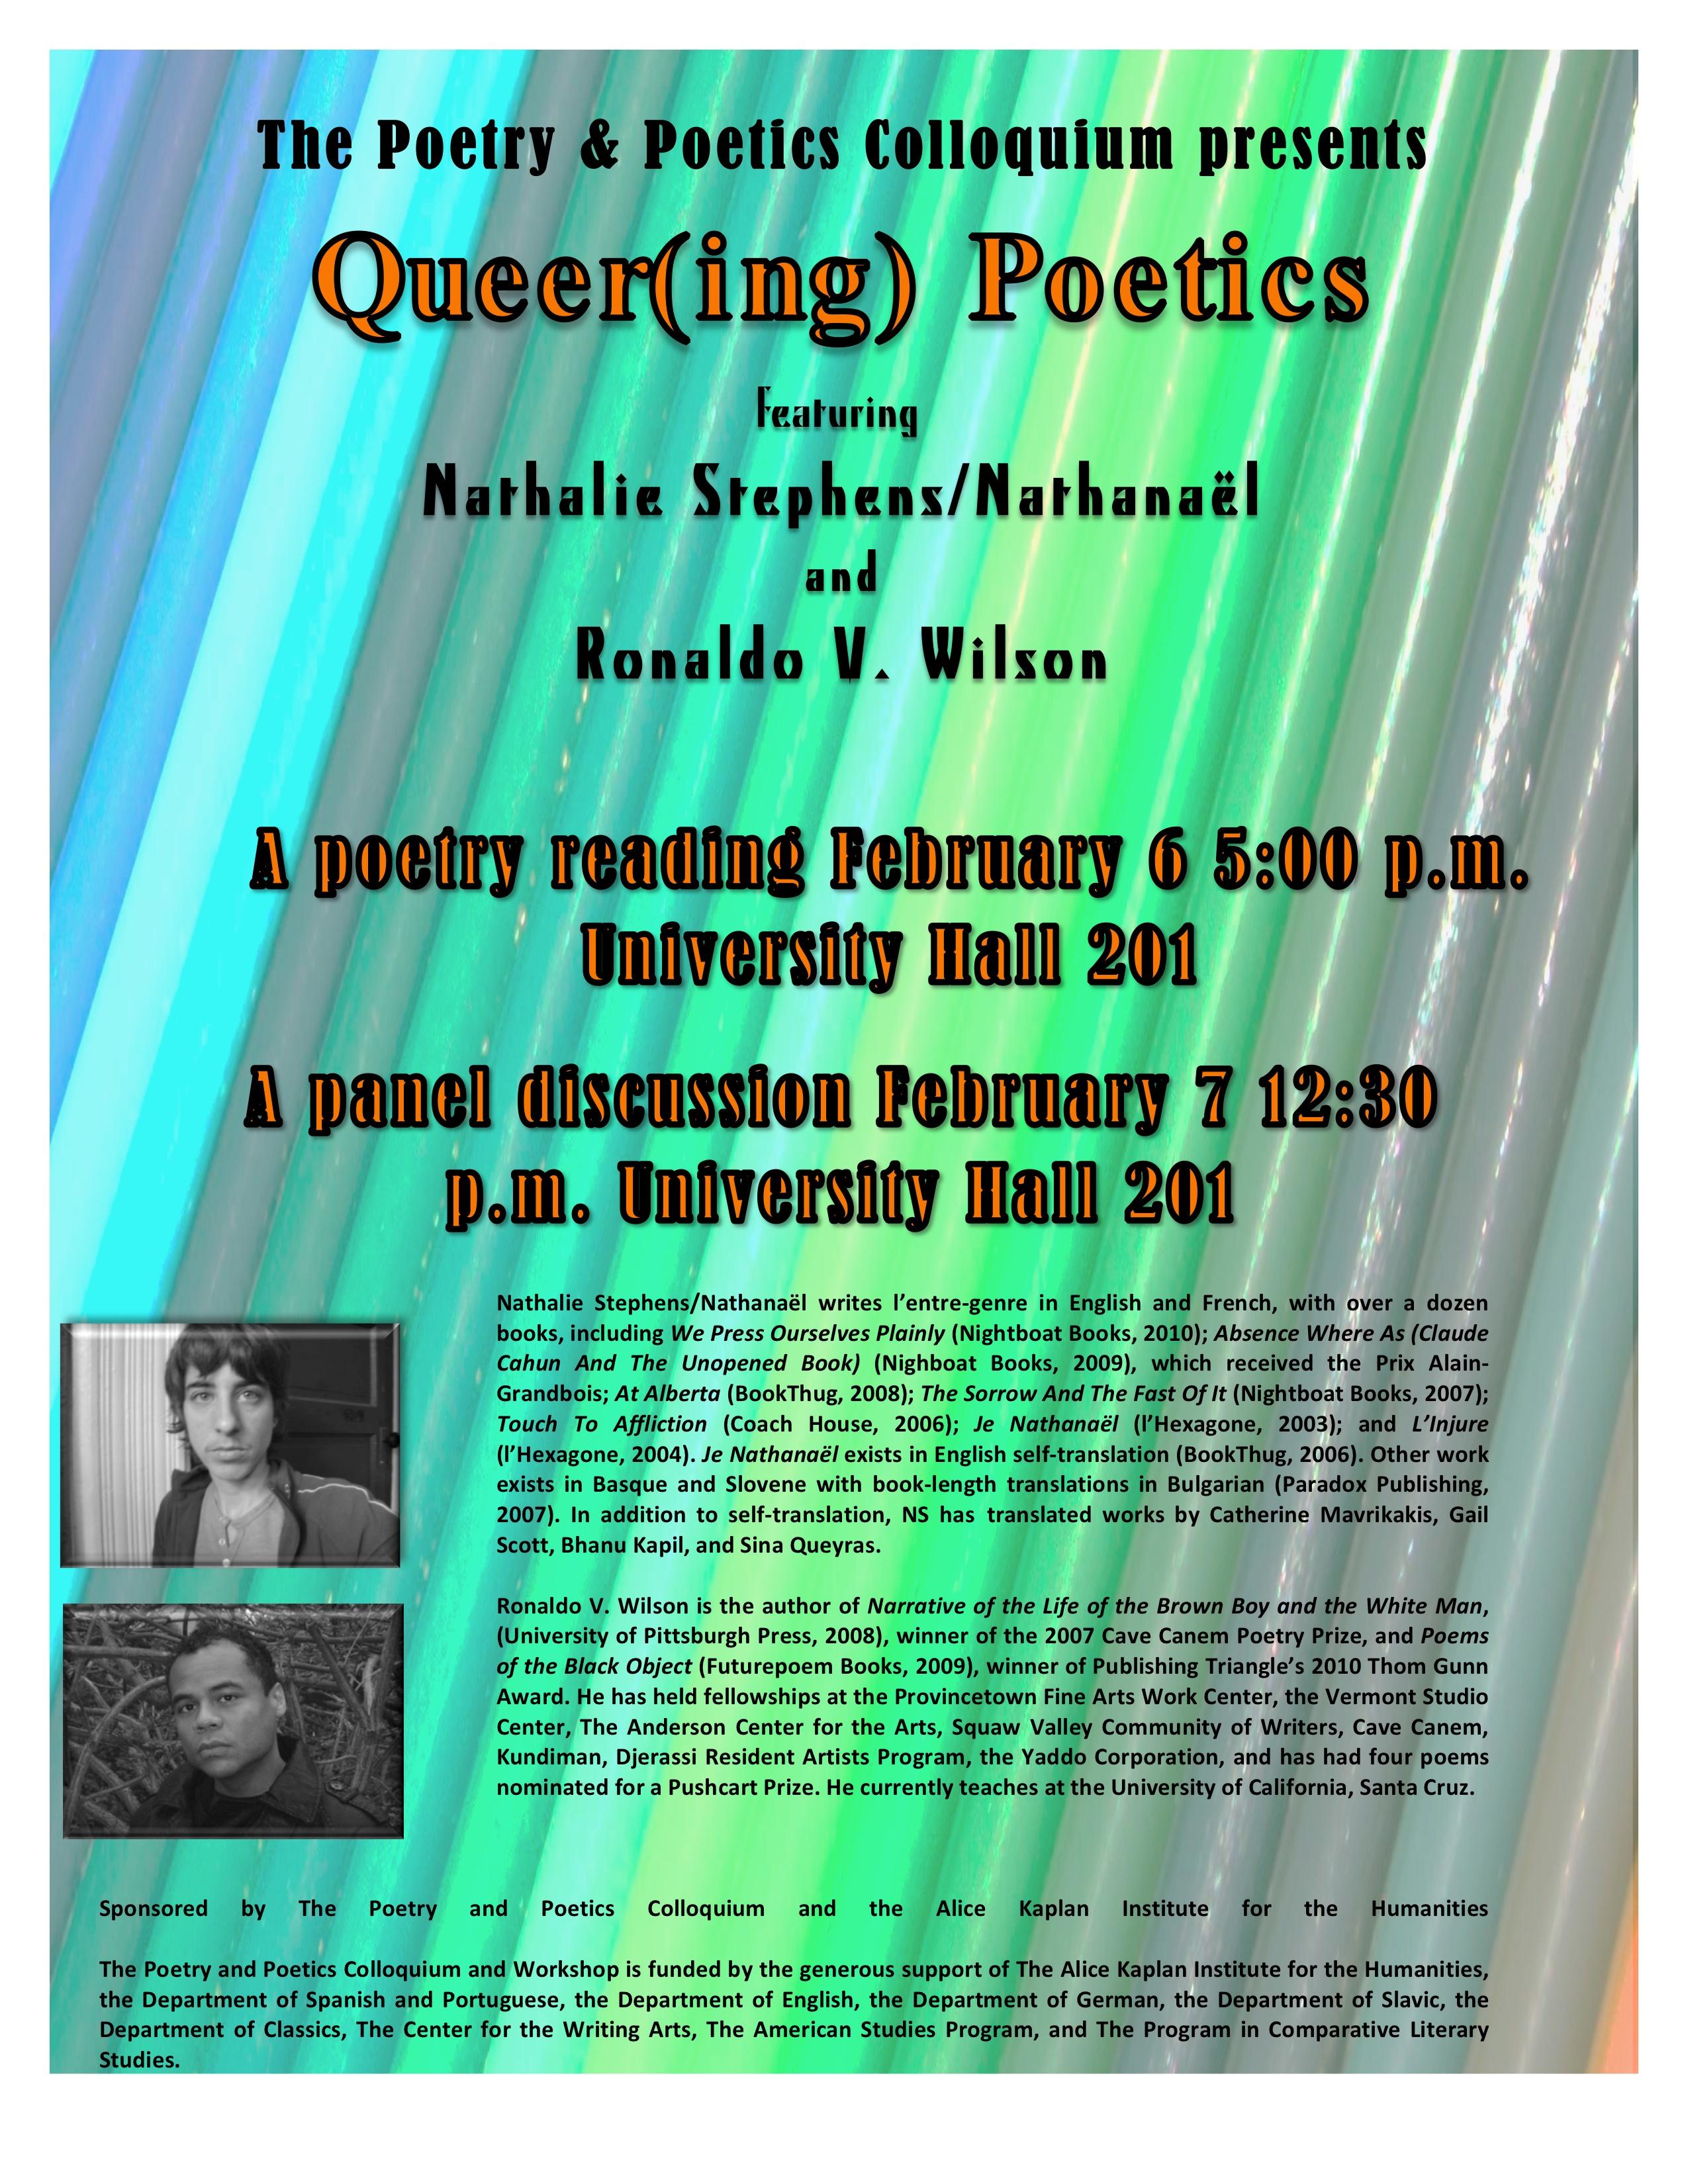 Queering Poetics poster